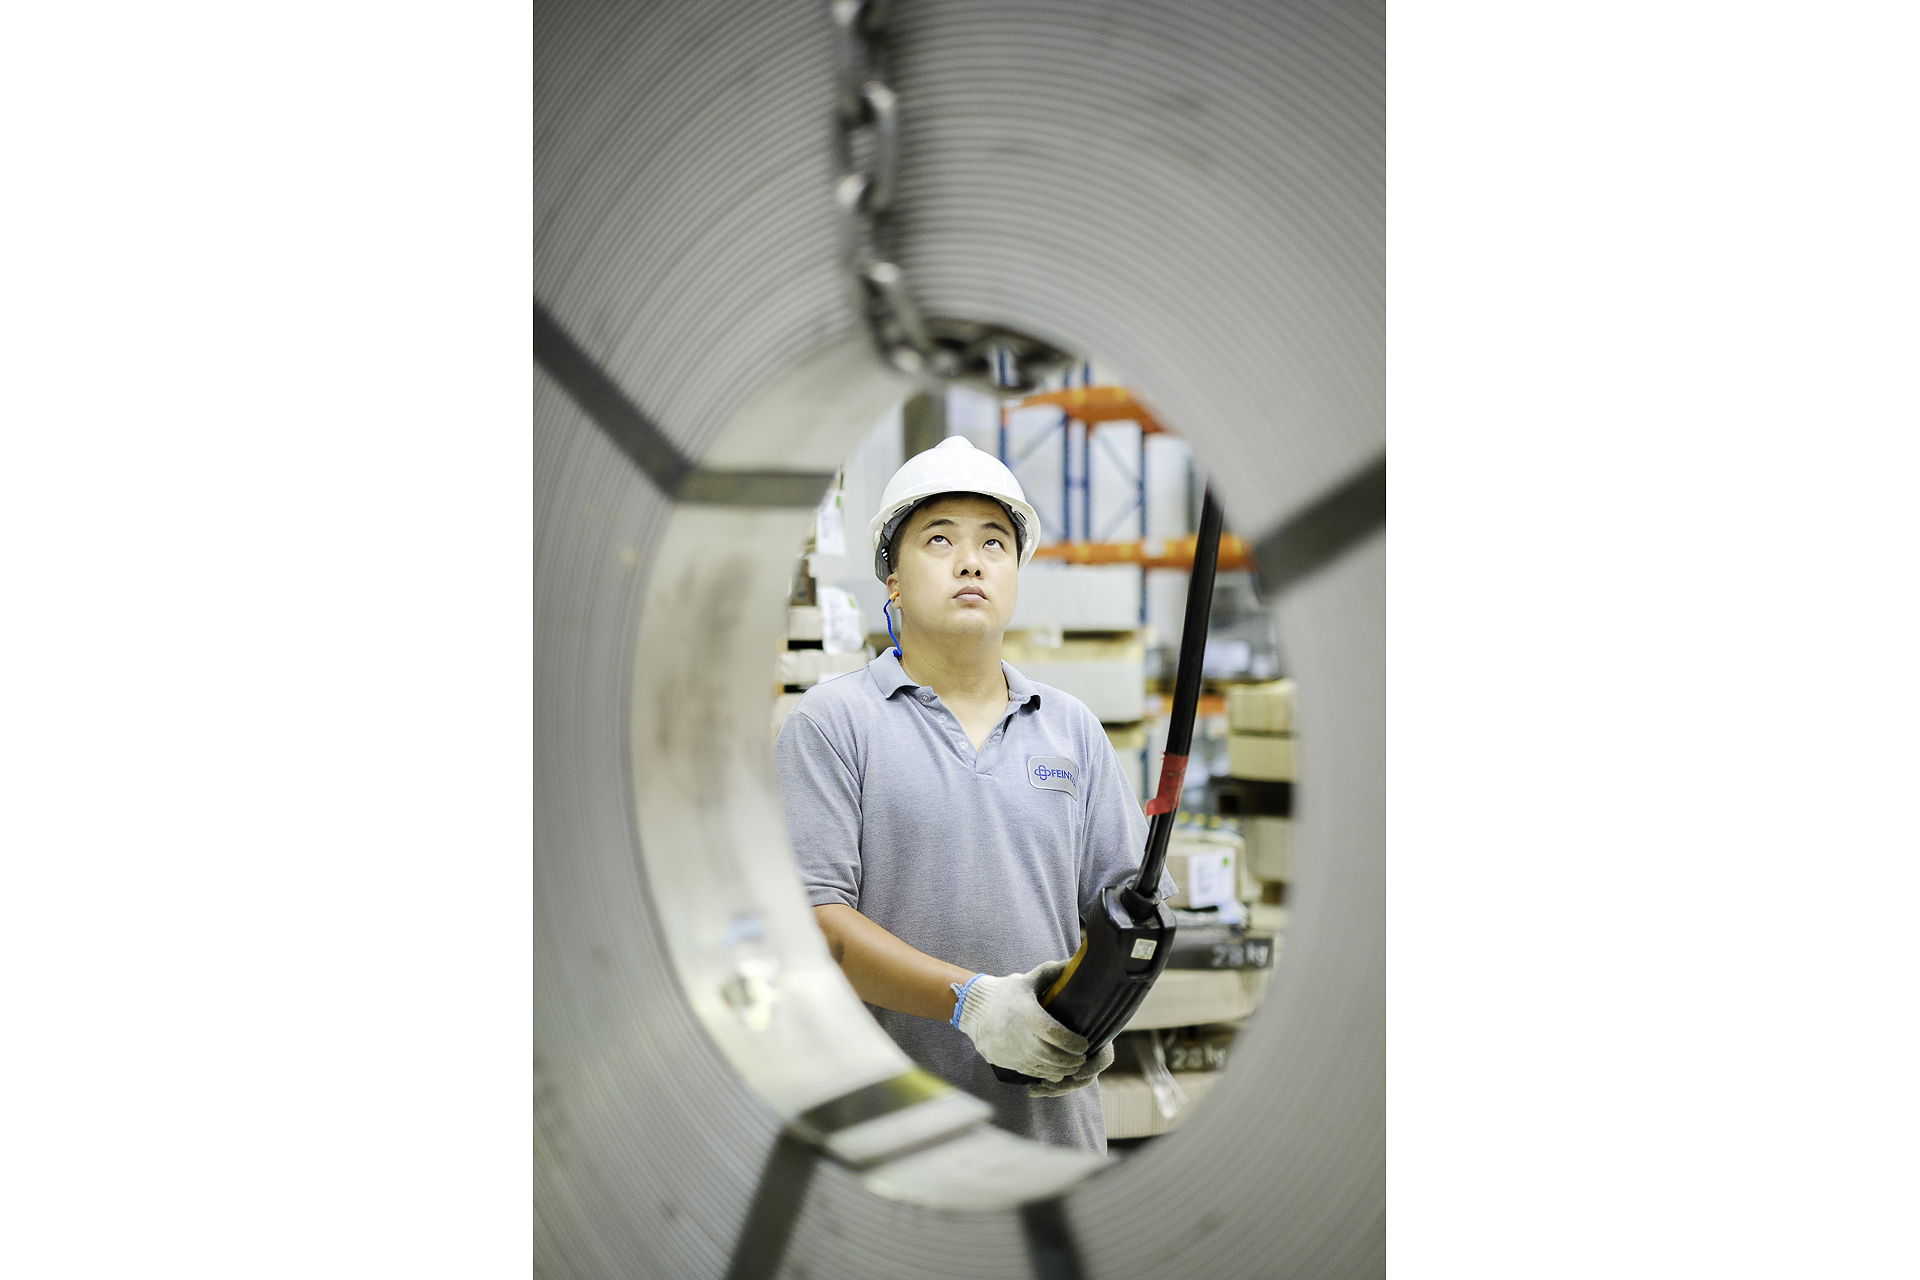 FEINTOOL, Tianjin plant, @ Rudolf Wichert